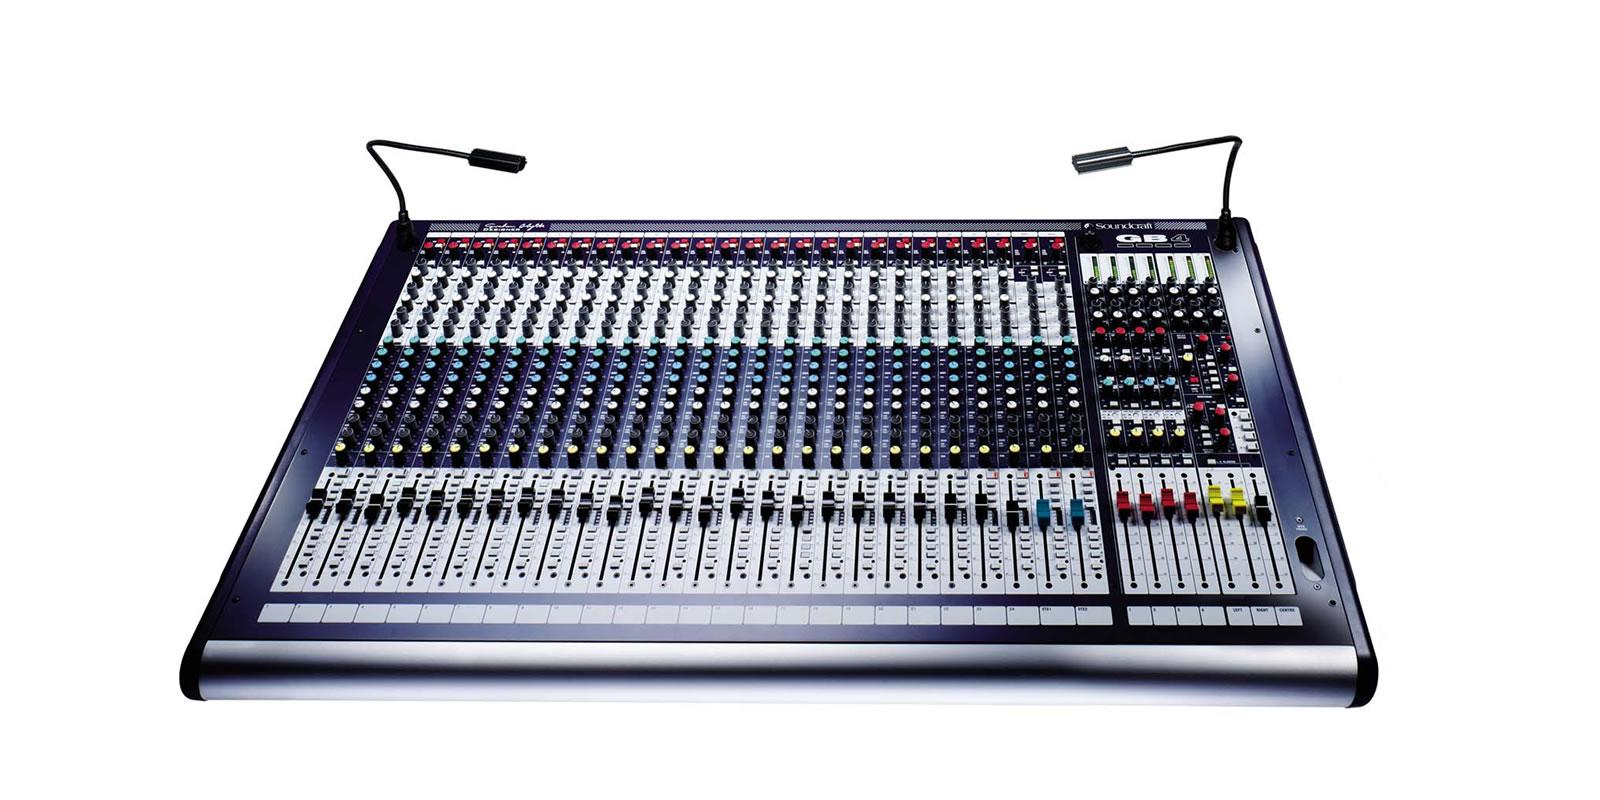 gb4 soundcraft professional audio mixers. Black Bedroom Furniture Sets. Home Design Ideas